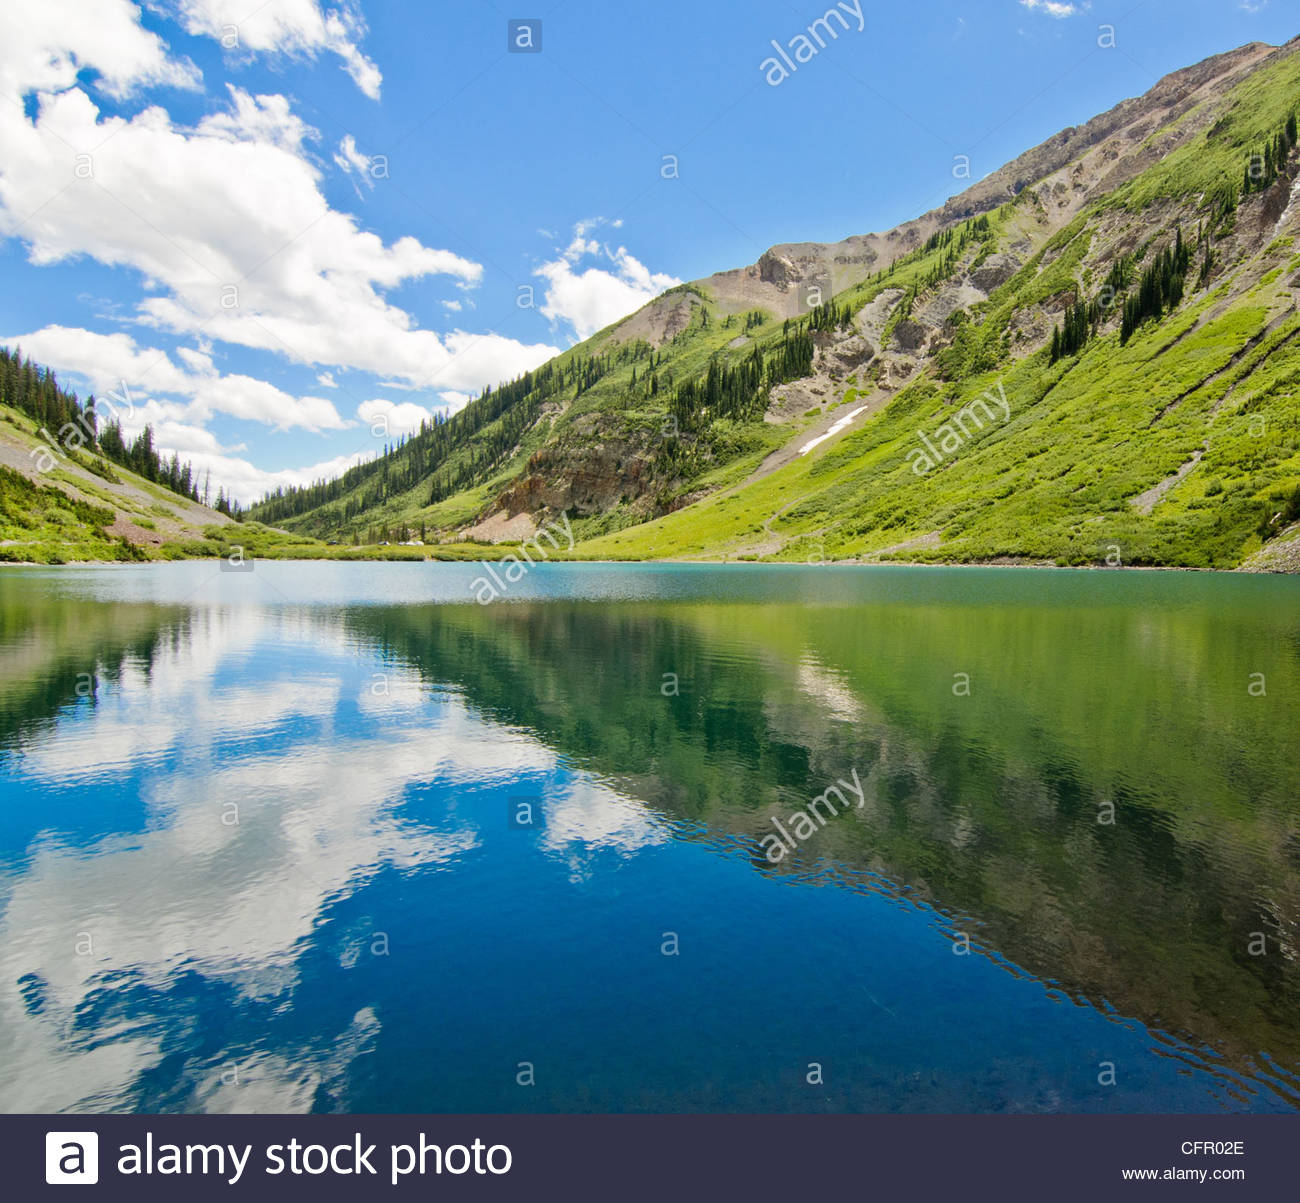 Emerald Lake, Gothic Natural Area, Aug 10, 2010 - Stock Image